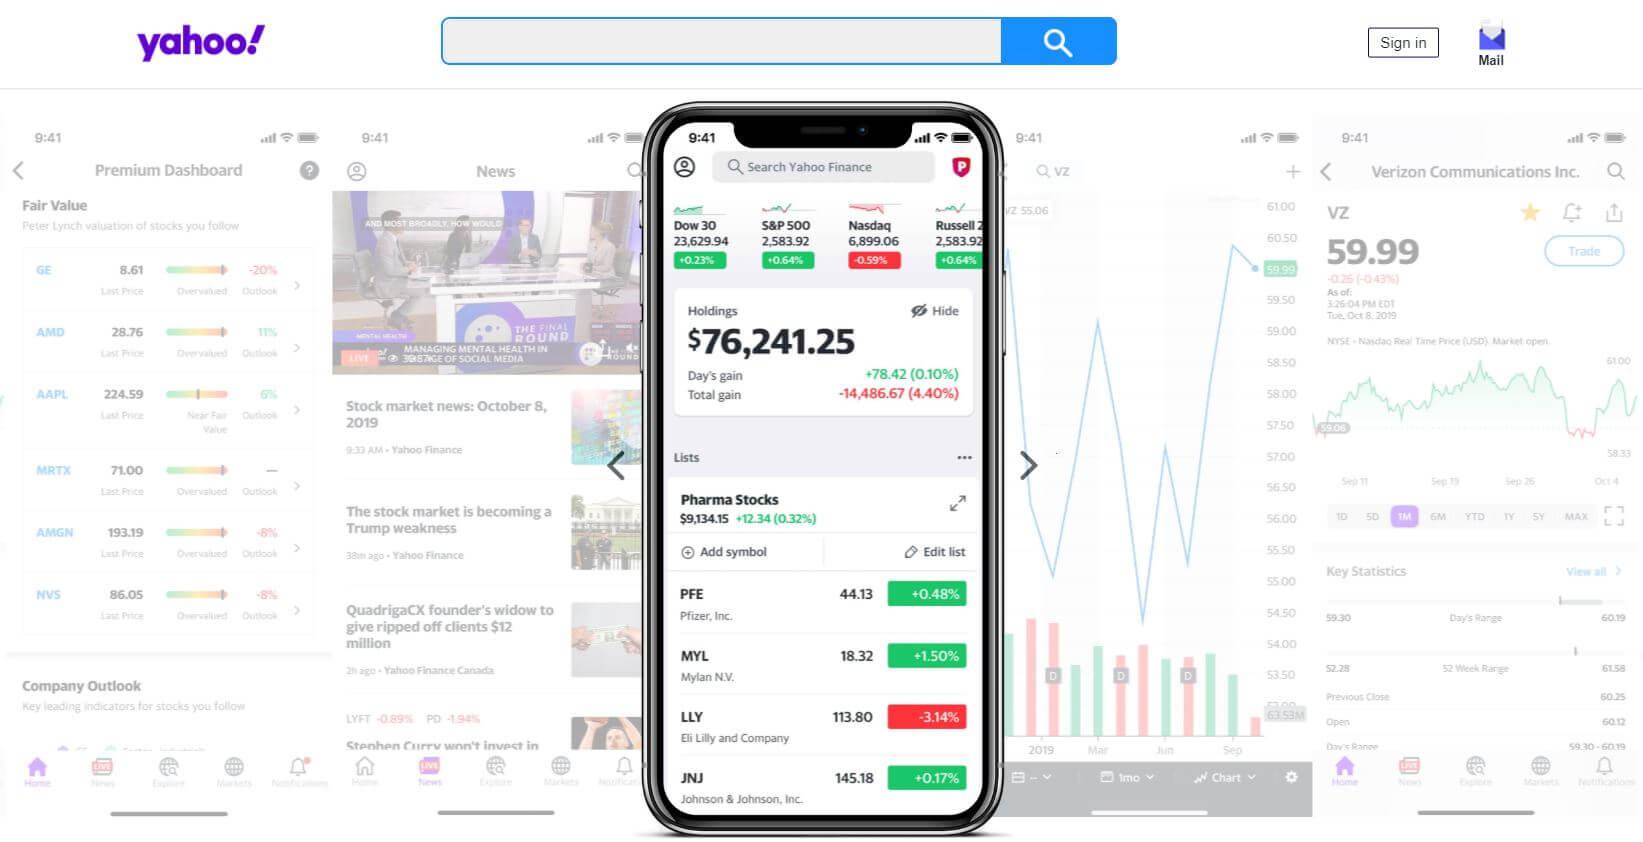 yahoo finance mobile app